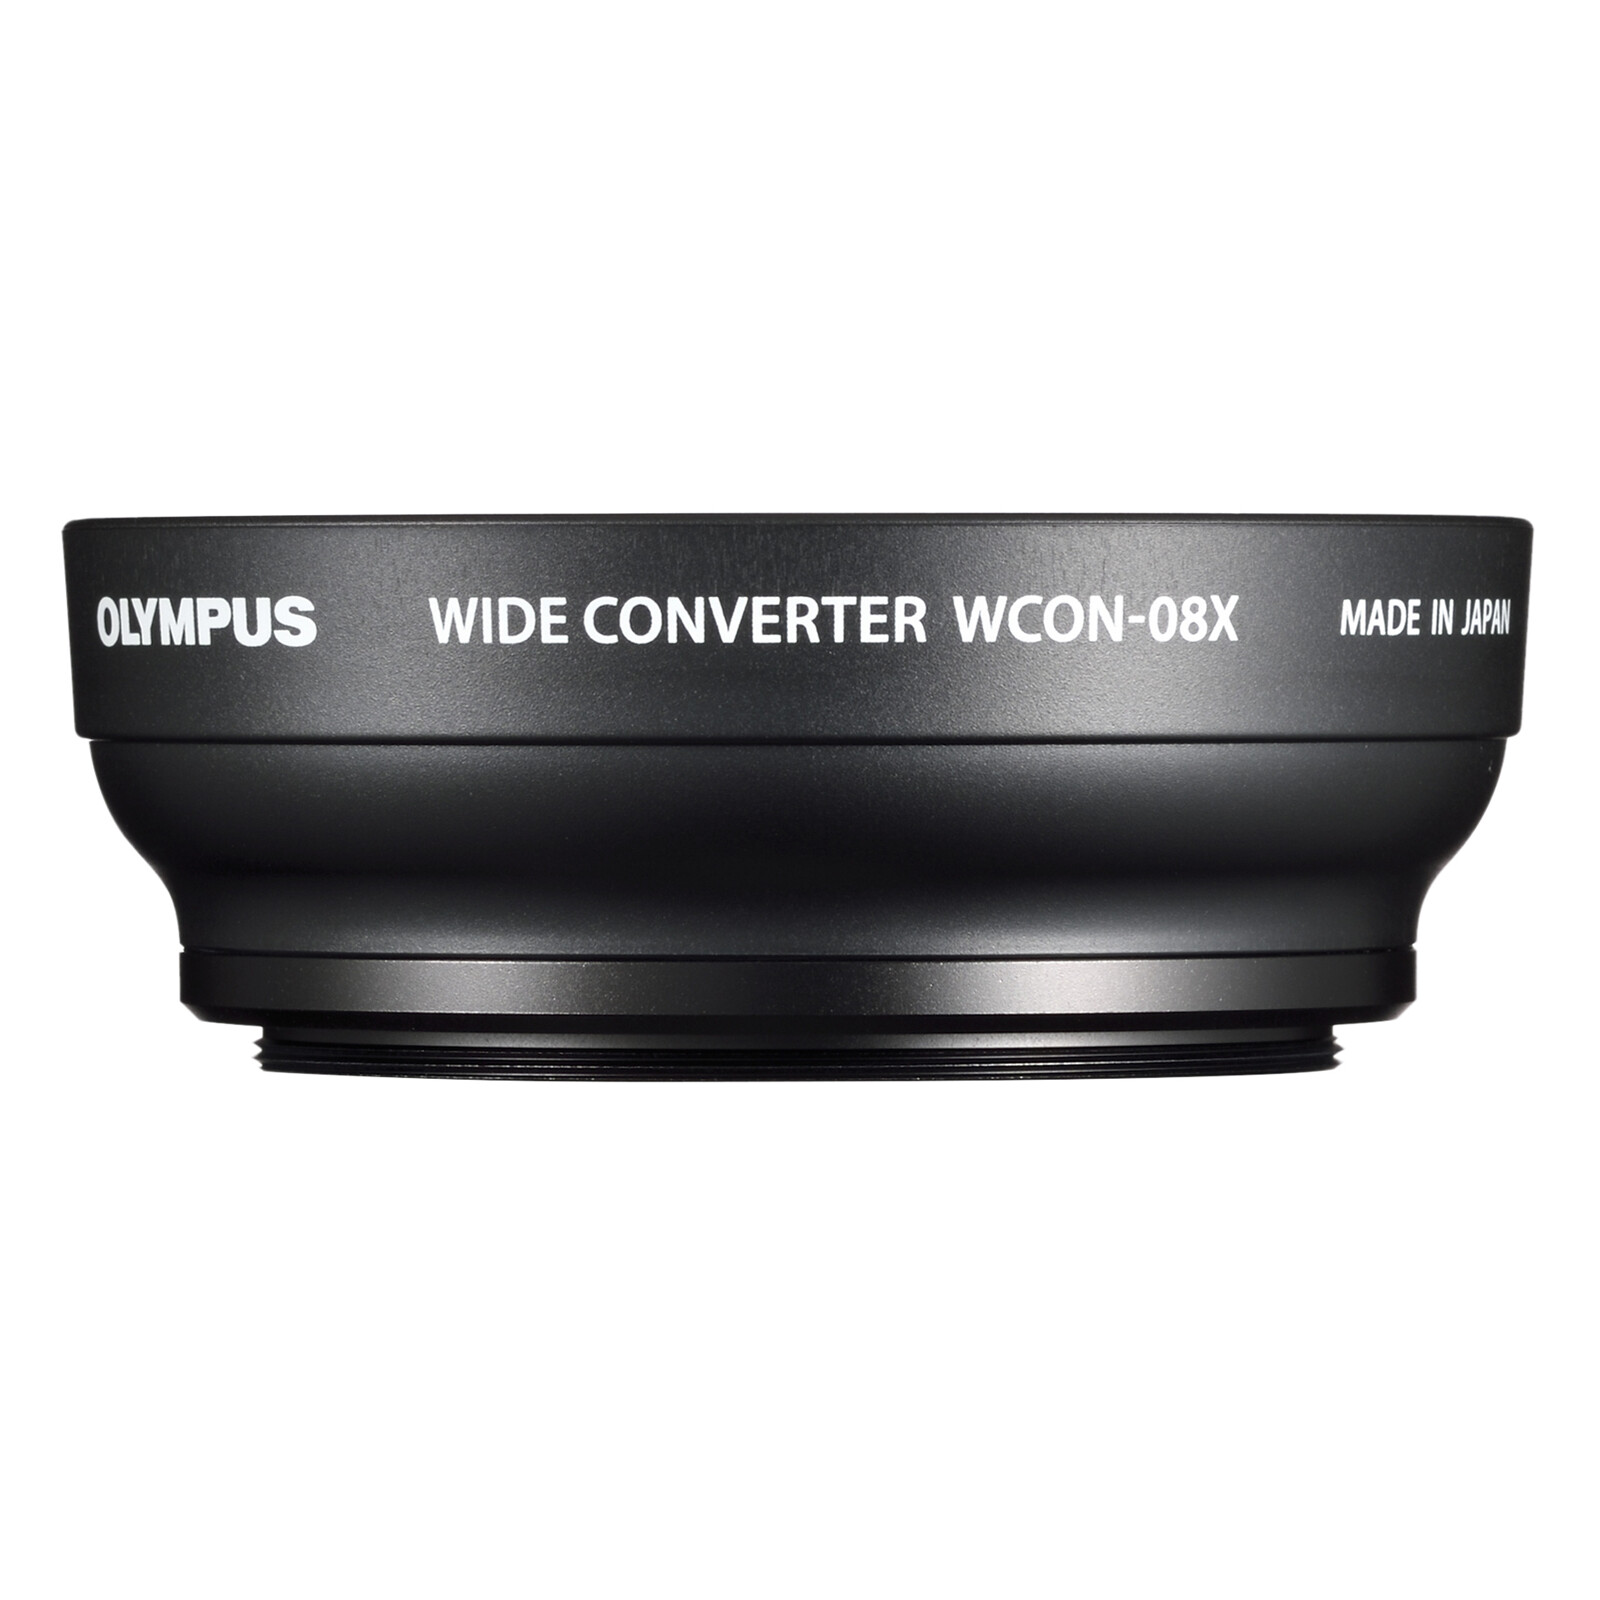 Olympus WCON-08X Wide Converter